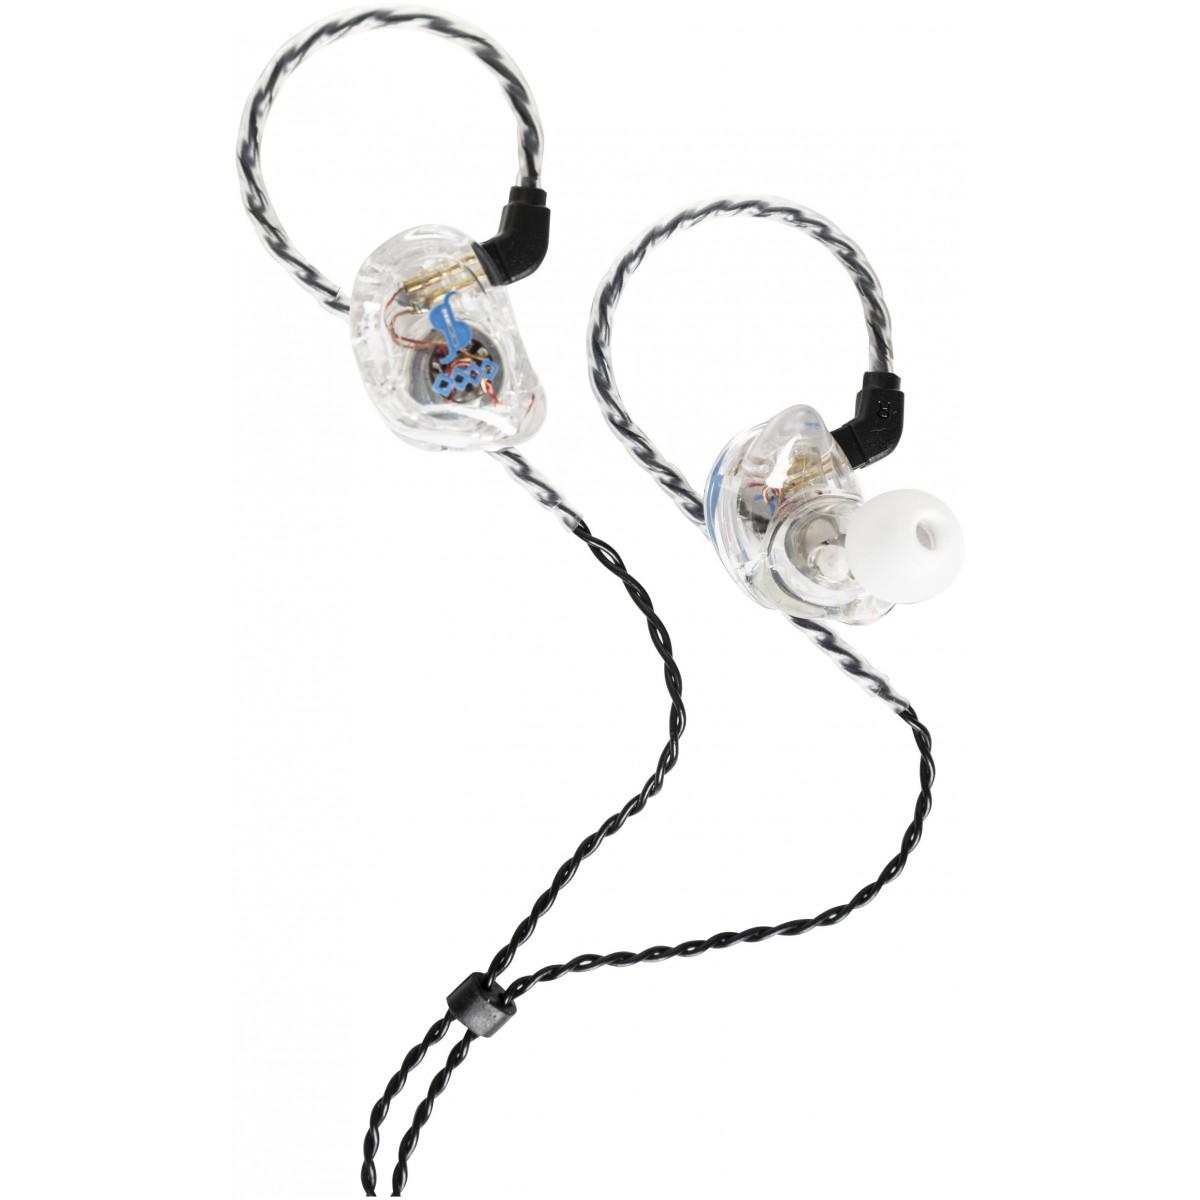 Stagg SPM-435 BK 4-driver, In-Ear sluchátka, transparentní